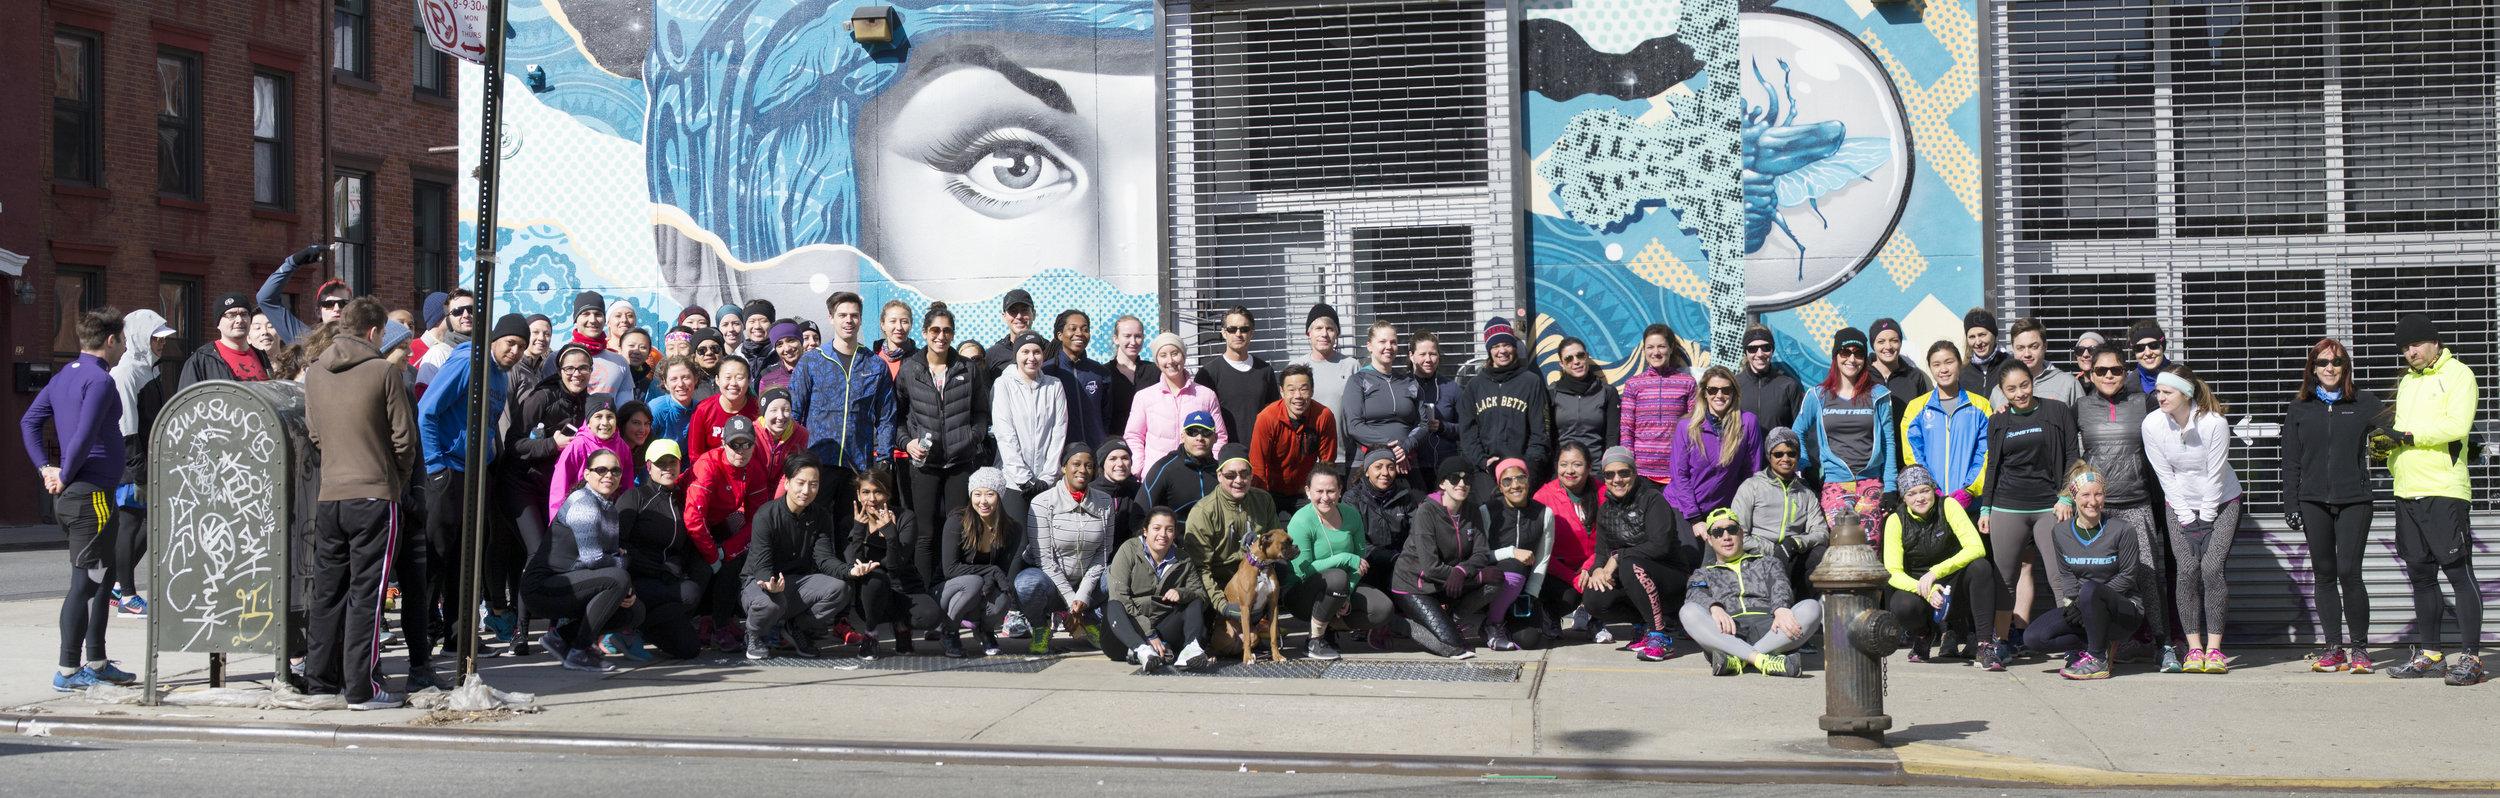 Tristan Eaton mural from Runstreet Art Run in Williamsburg. Photo by  Filles + Garcons .